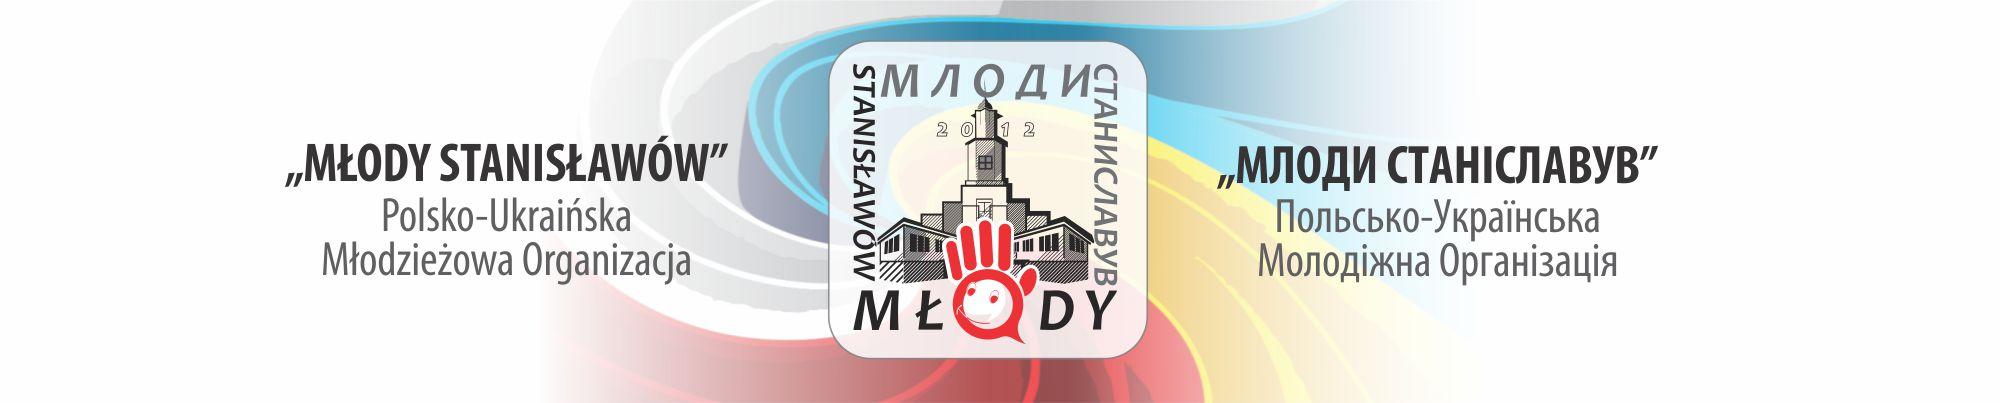 Mlody Stanislawow